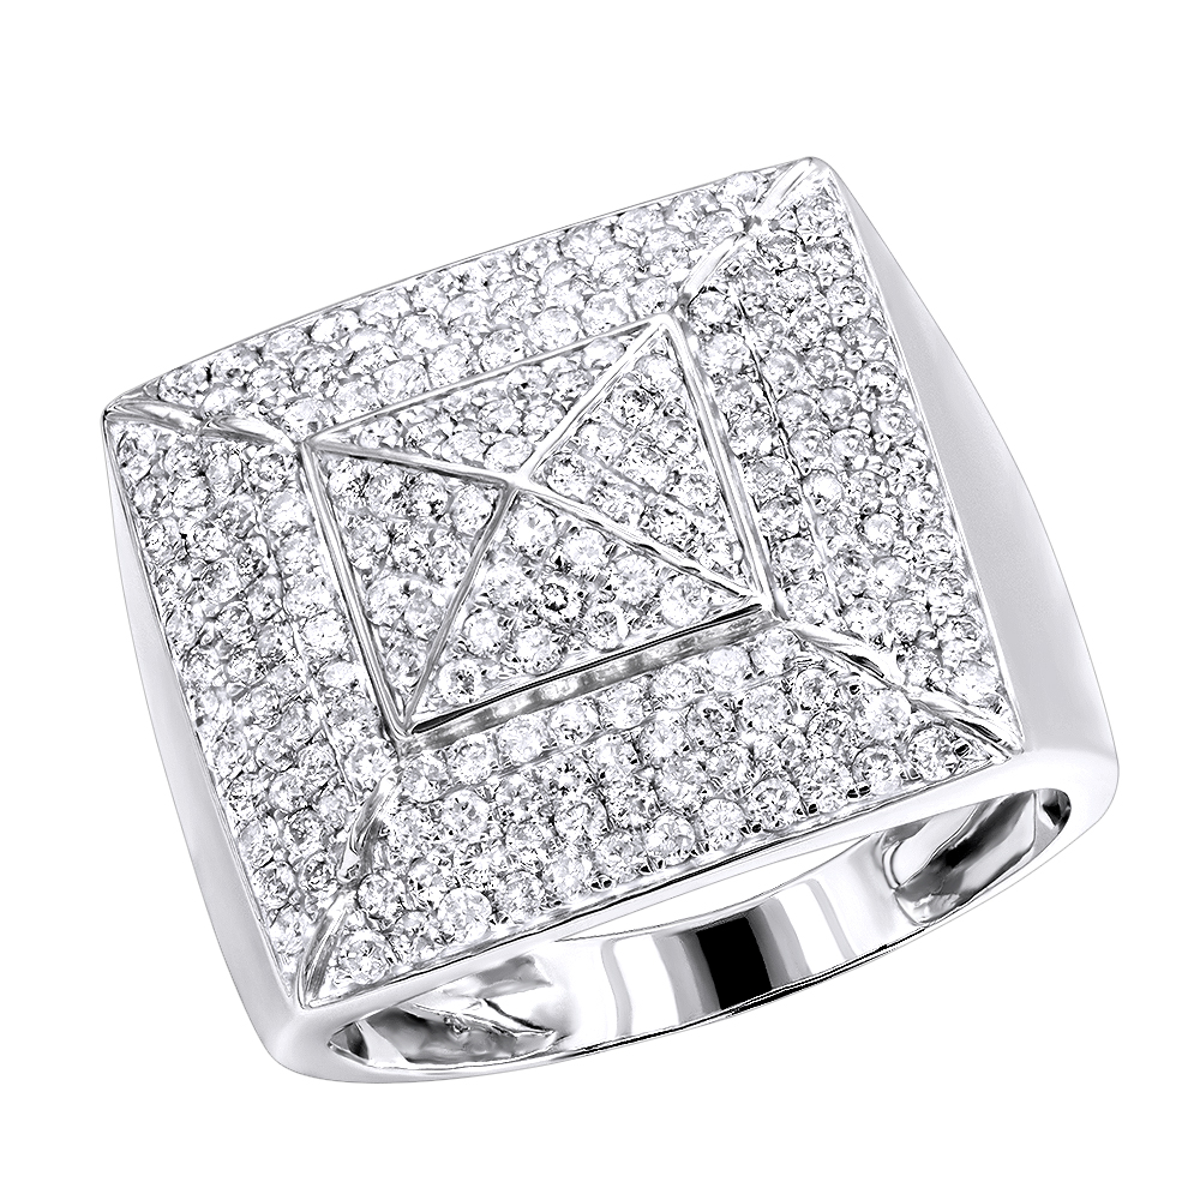 Solid 10K Gold Pyramid Shaped 2 Carat Diamond Mens Pinky Ring LUXURMAN